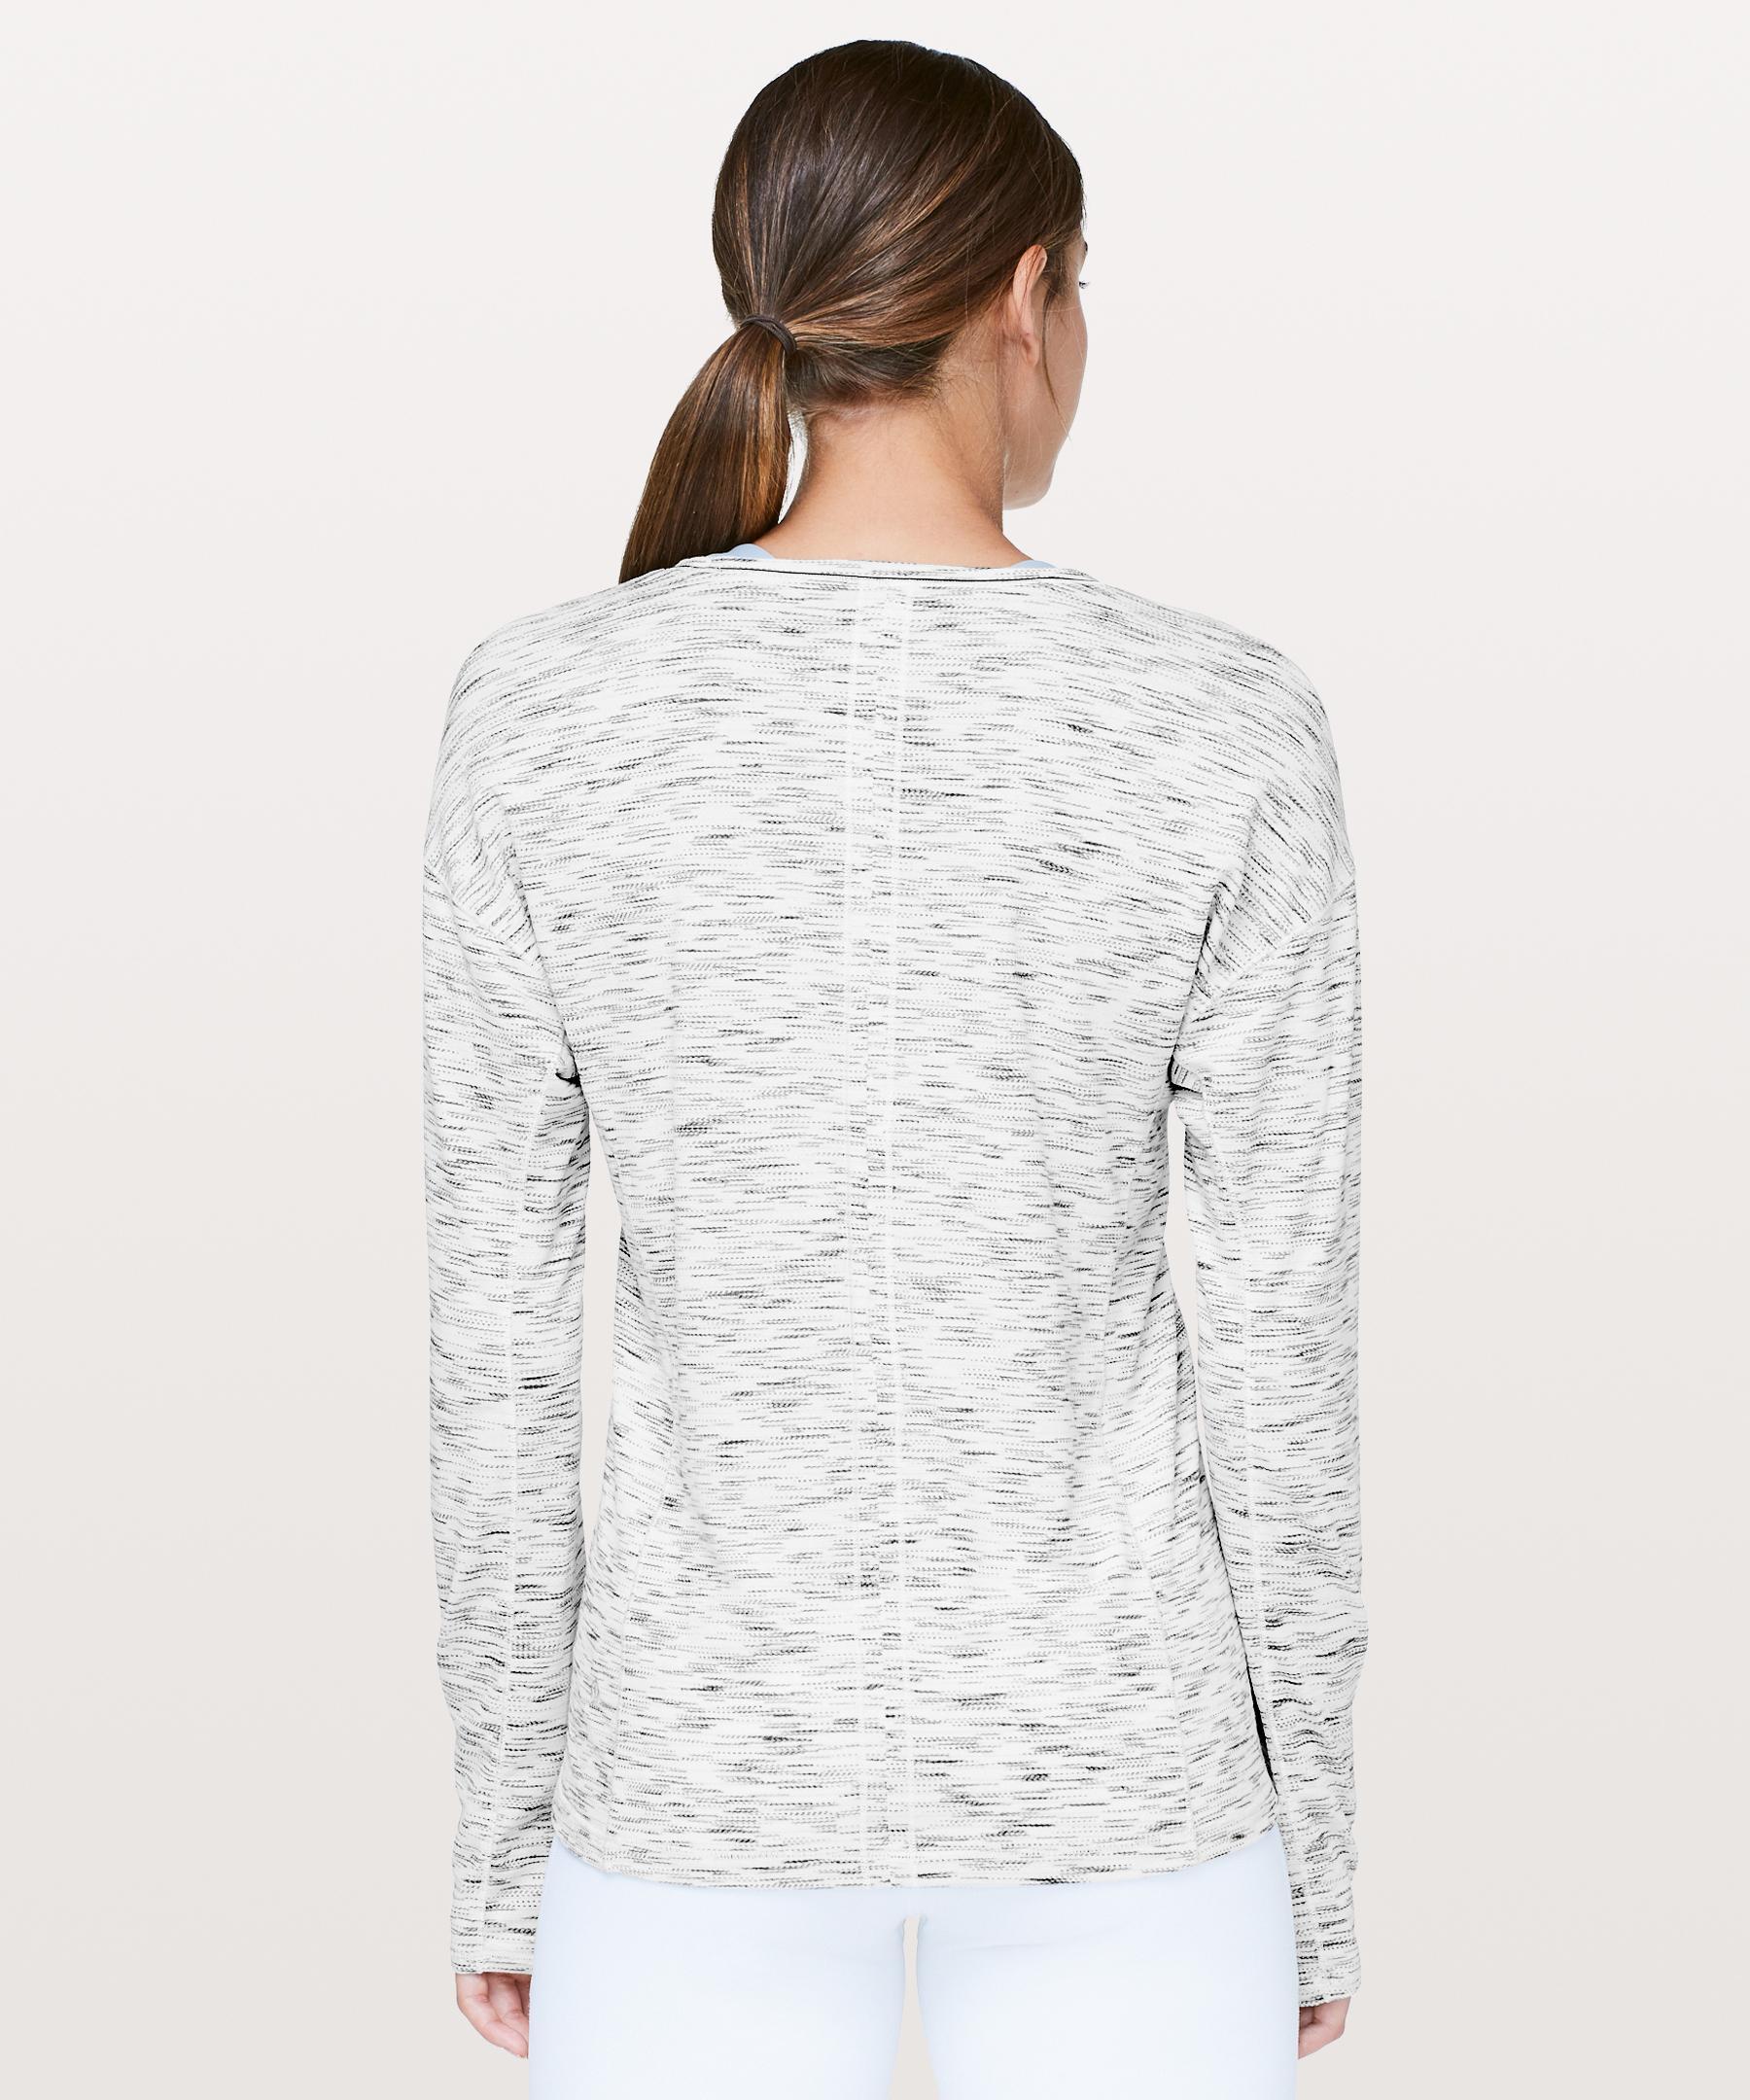 8f06017b20 Lyst - lululemon athletica Sweat Embrace Long Sleeve in White